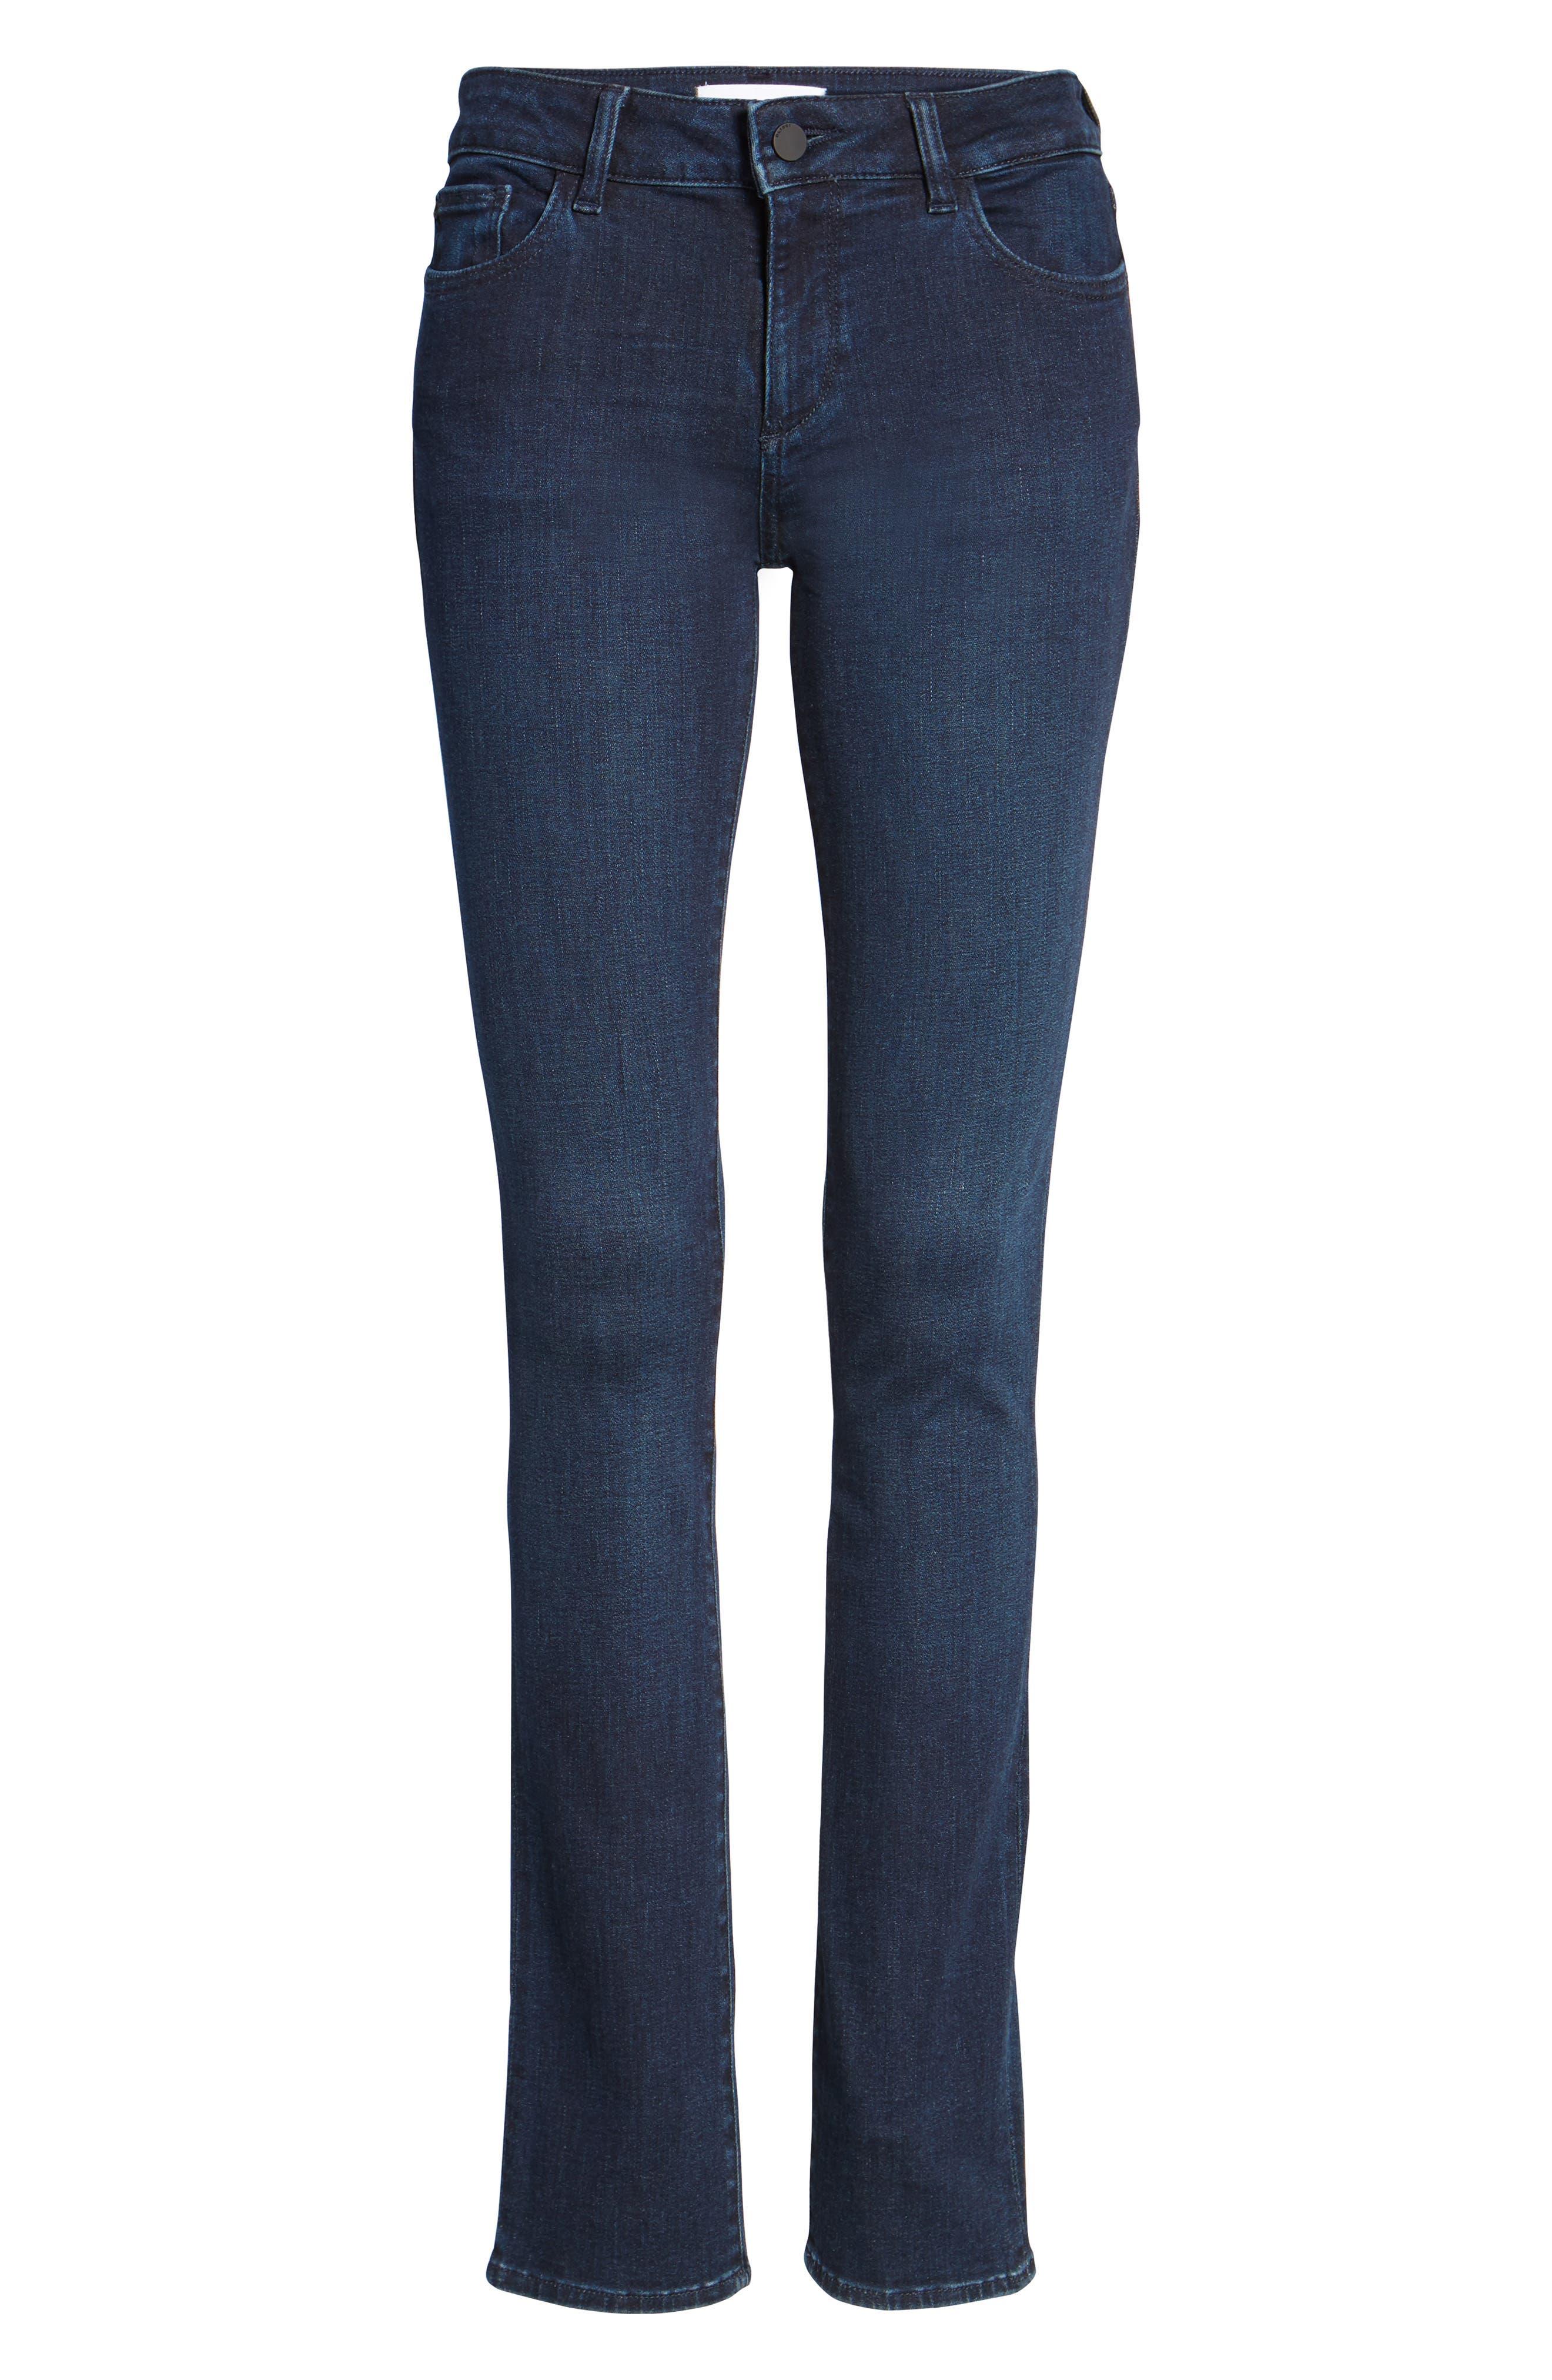 Mara Instasculpt Straight Leg Jeans,                             Alternate thumbnail 6, color,                             405